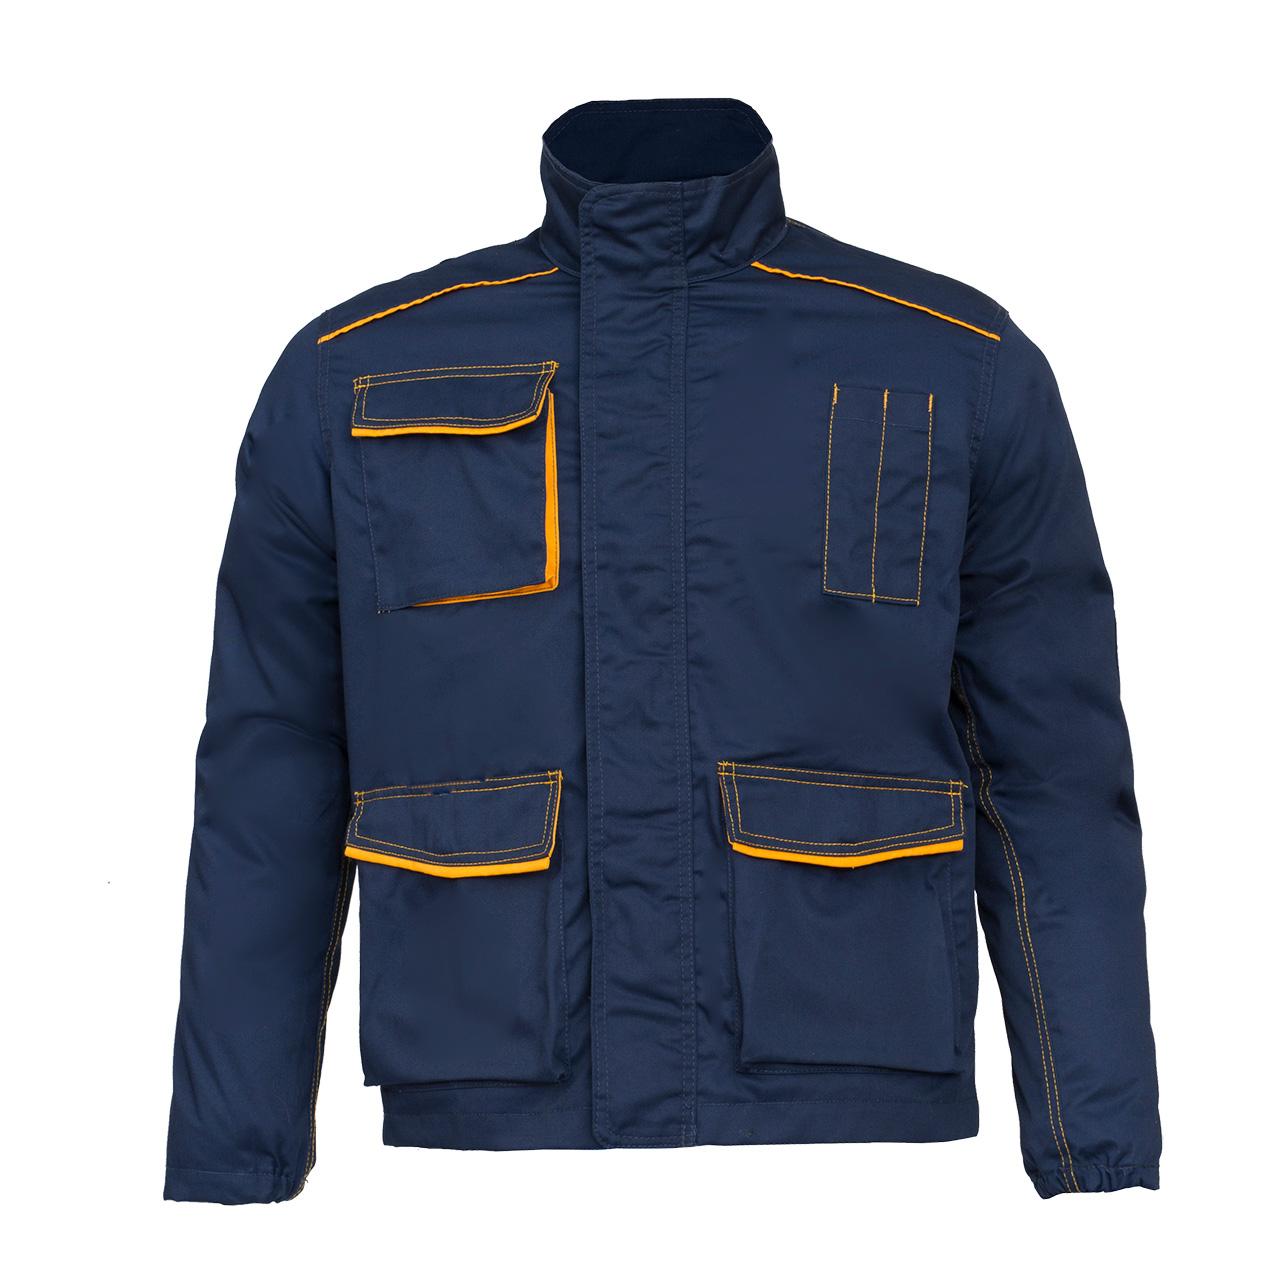 Radna jakna ATLANTIC plava